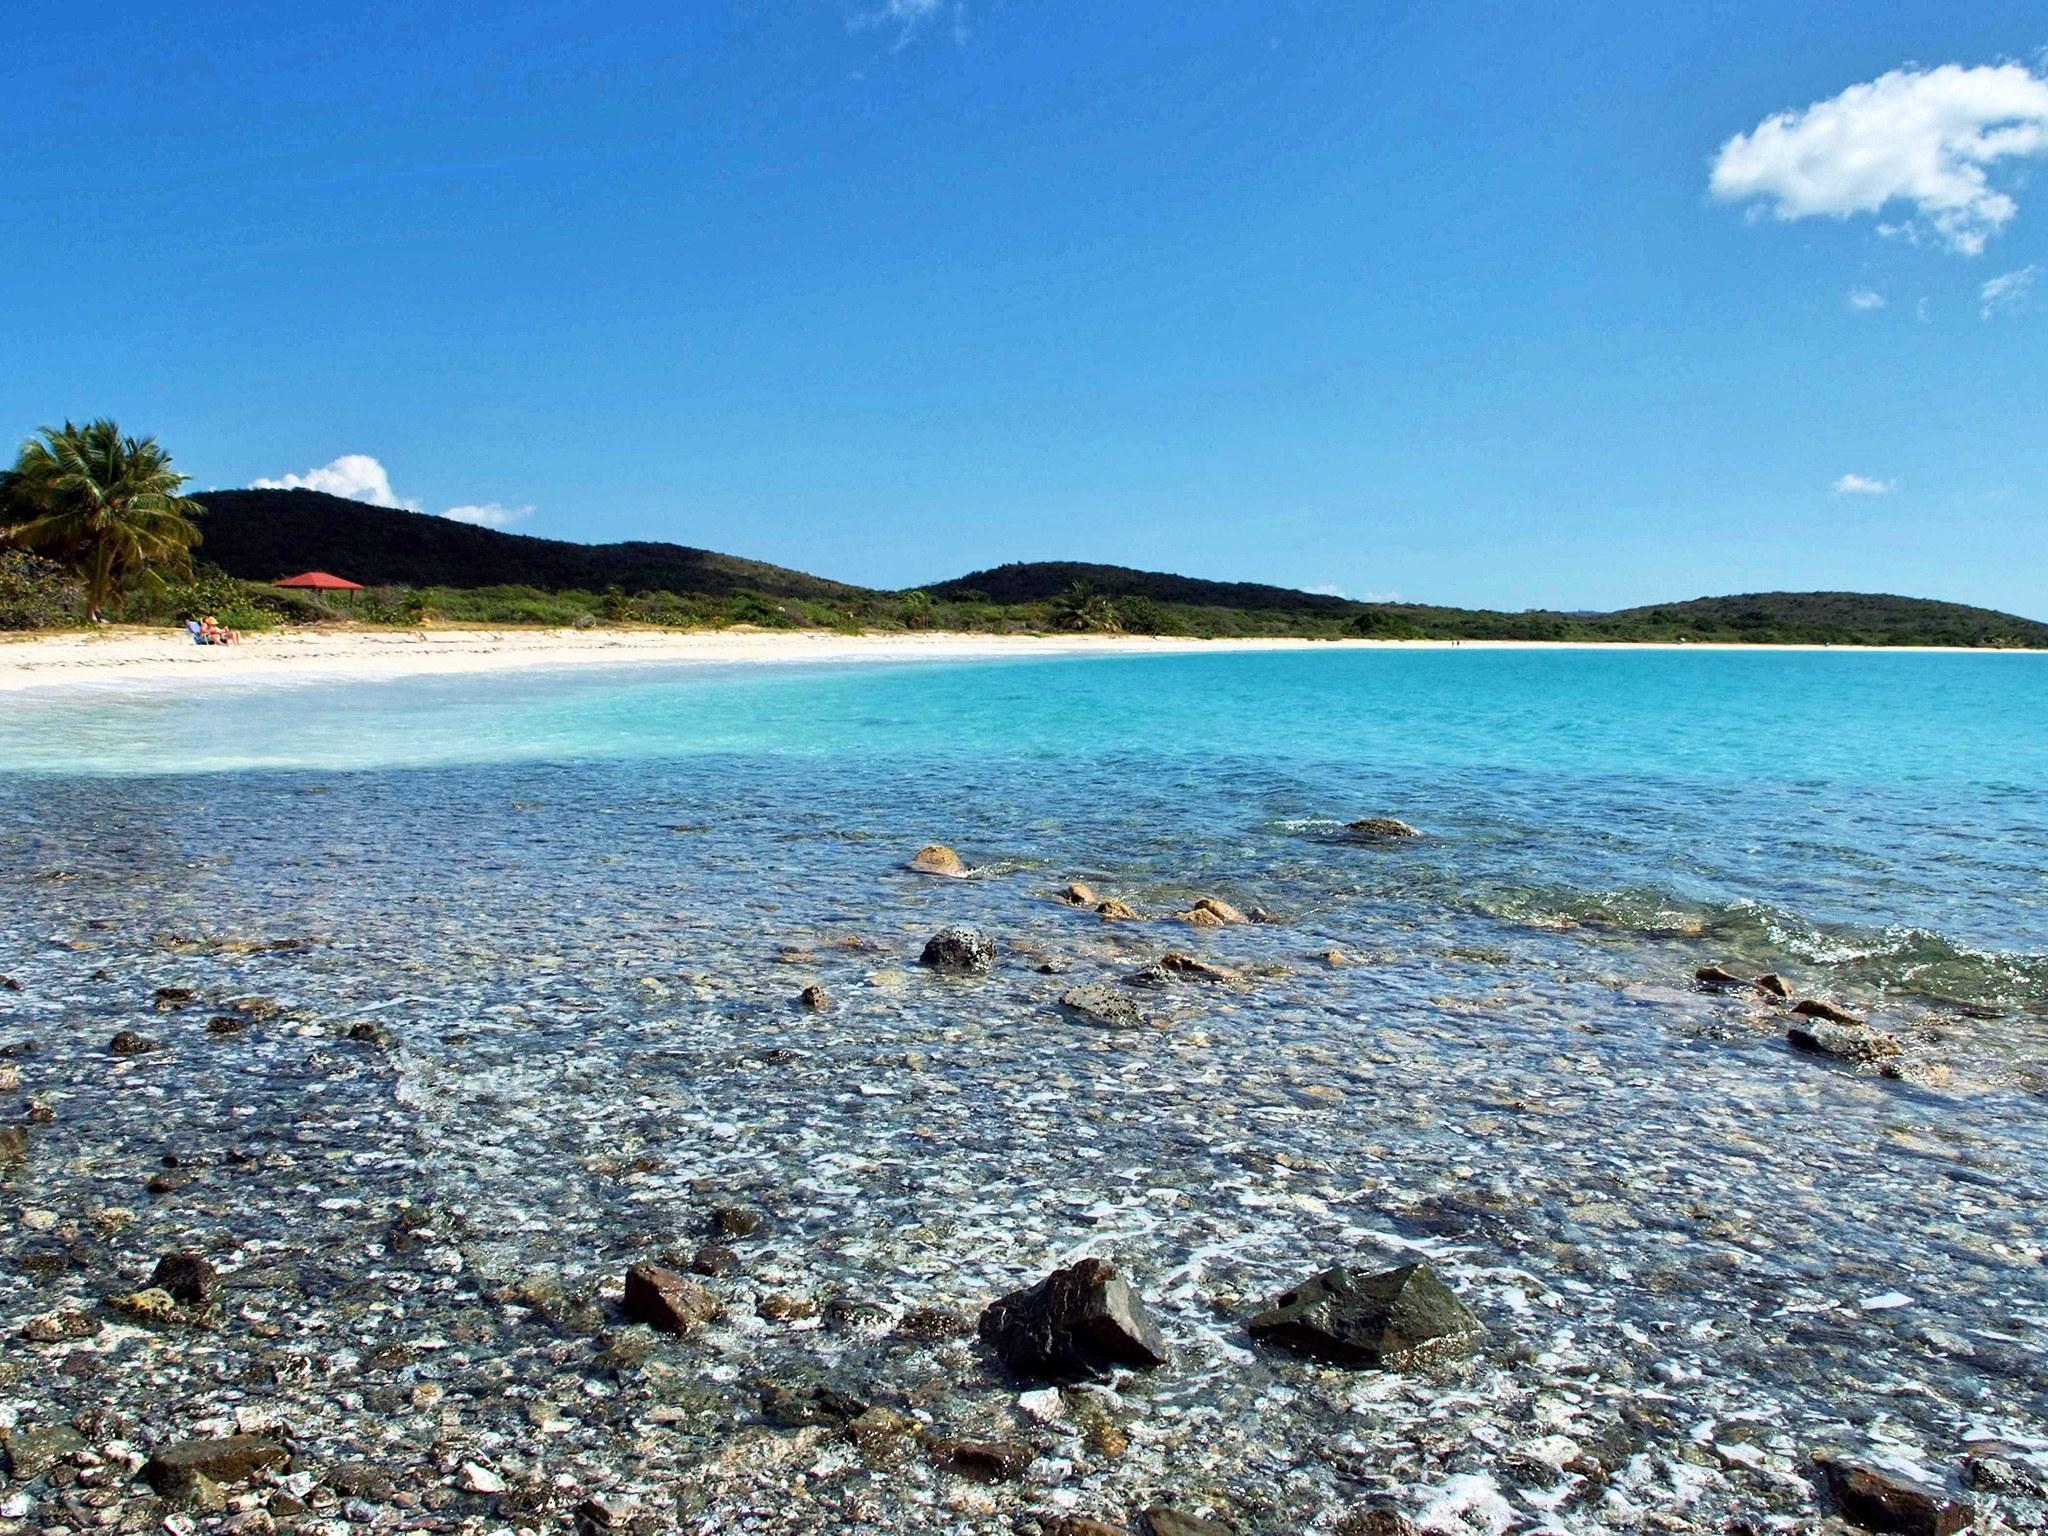 blue_beach_puero_rico_havasi_dorka_blog.jpg